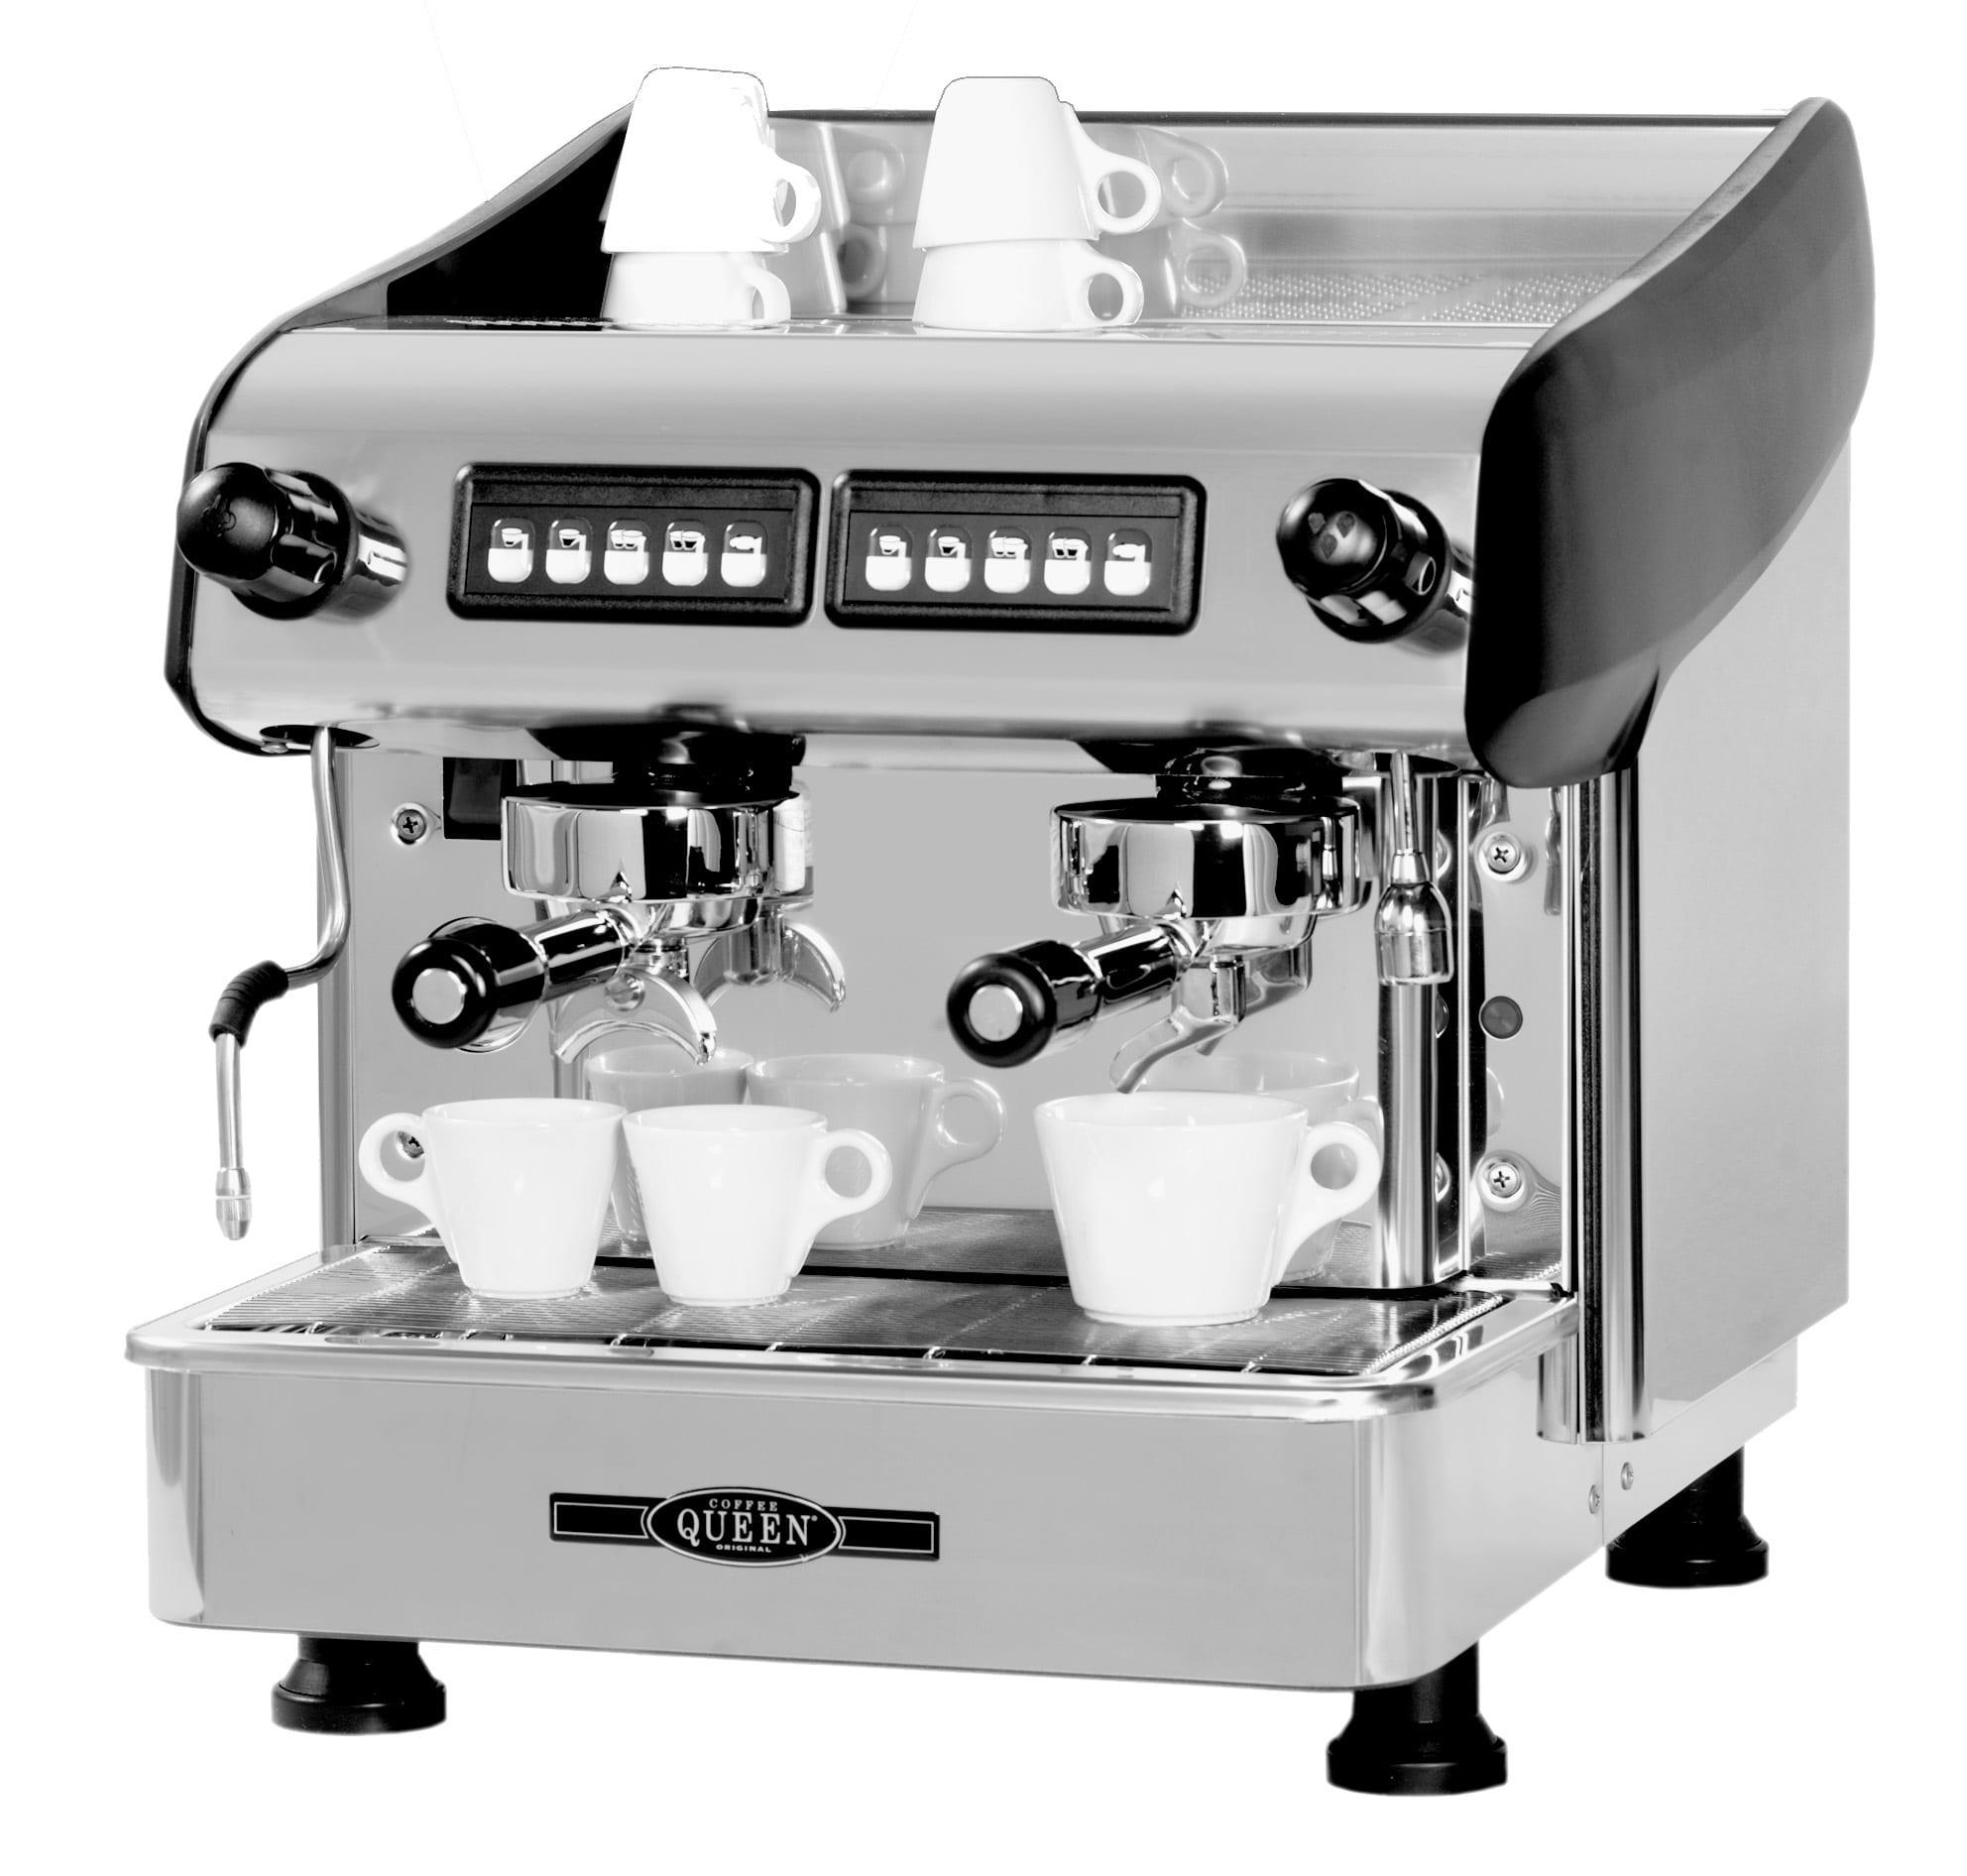 Espresso Machine 2 Groups Image